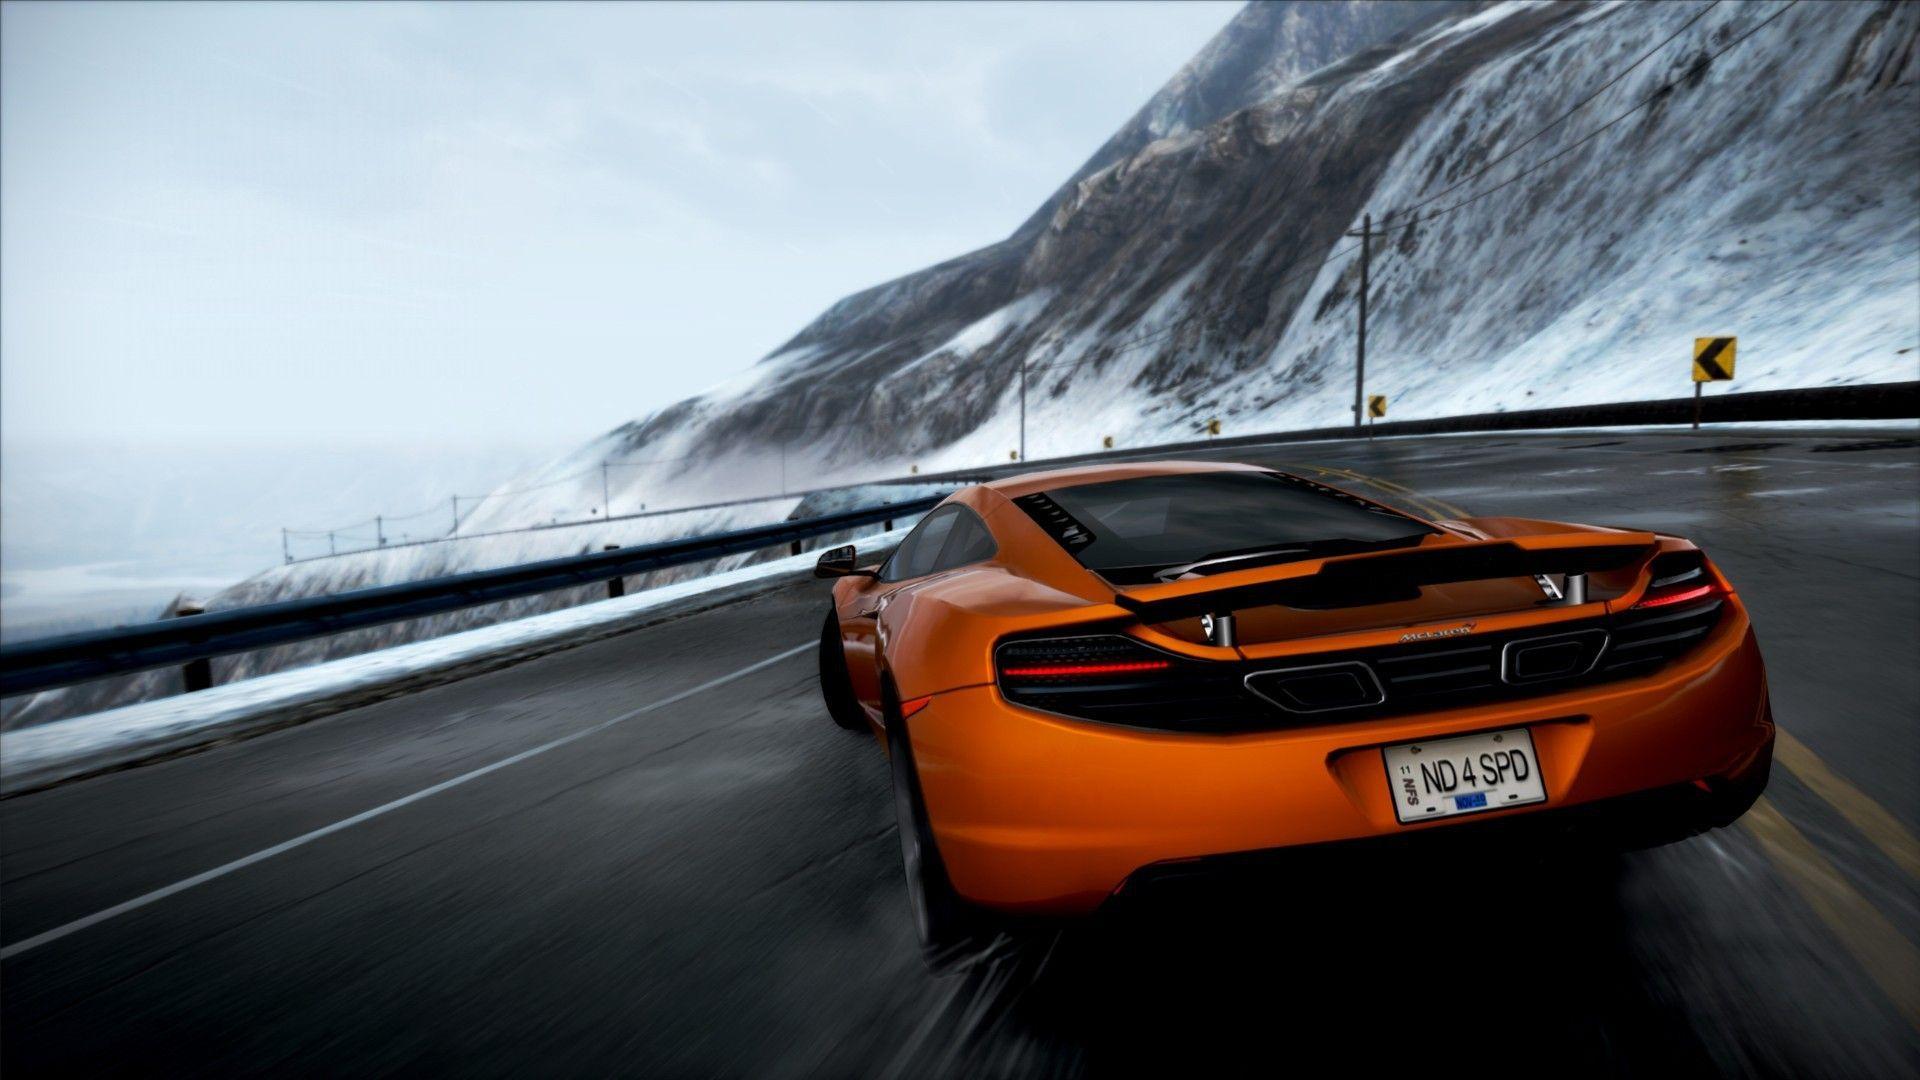 Need For Speed Mclaren Mp4 12c Hot Pursuit Wallpaper Need For Speed Mclaren Mp4 Mp4 12c